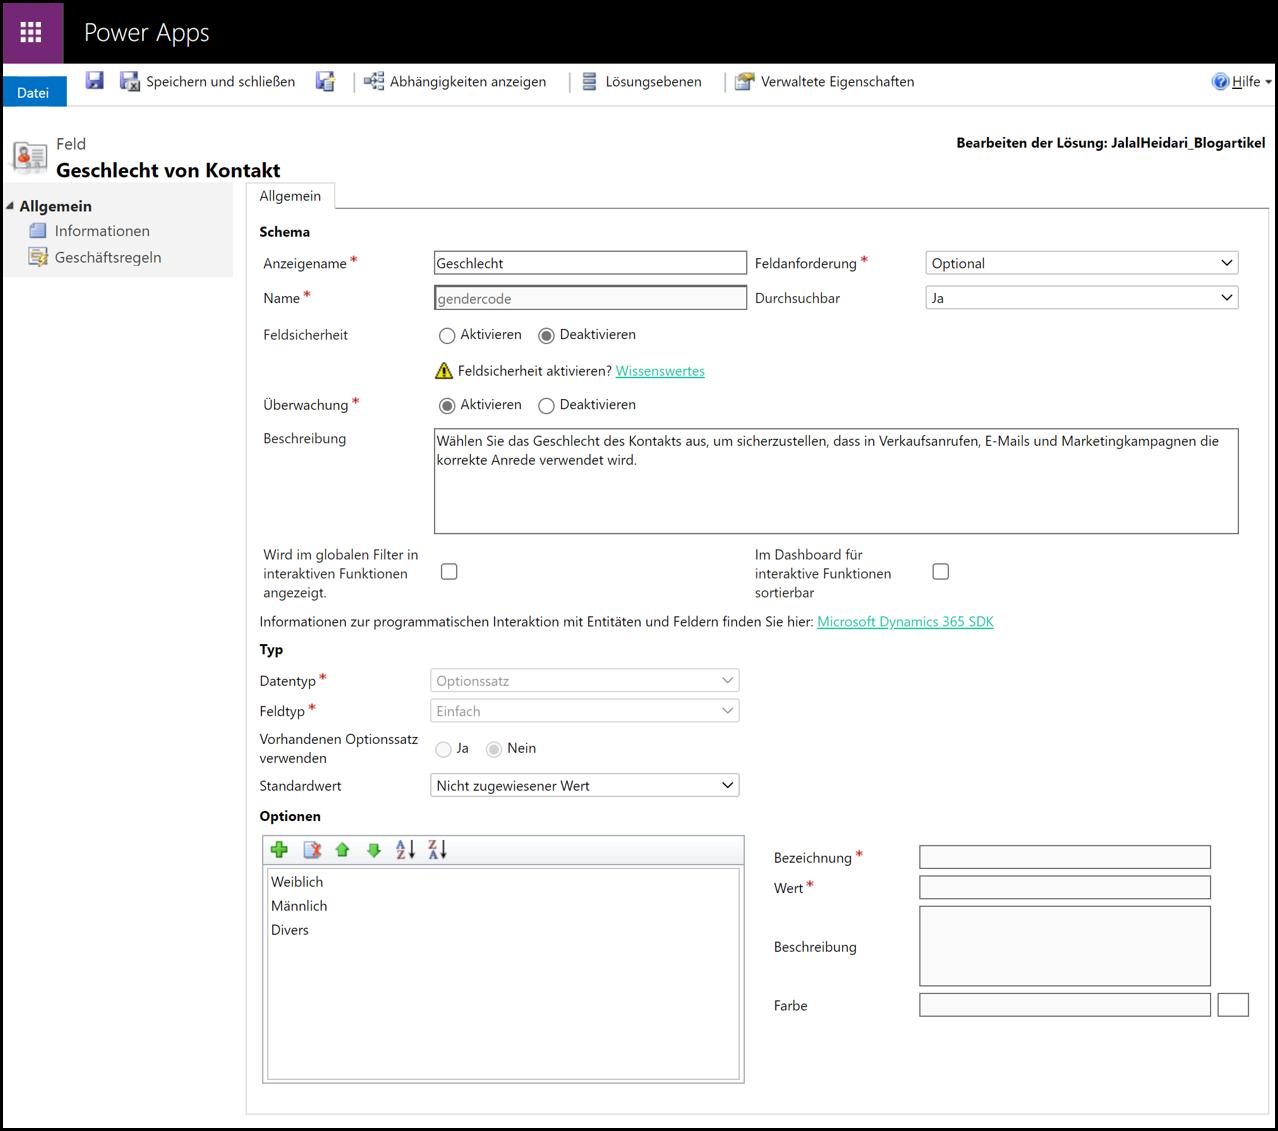 Microsoft_Dynamics _365_Grafiken_in_Ansichtsspalten_hinzufuegen_Abb2